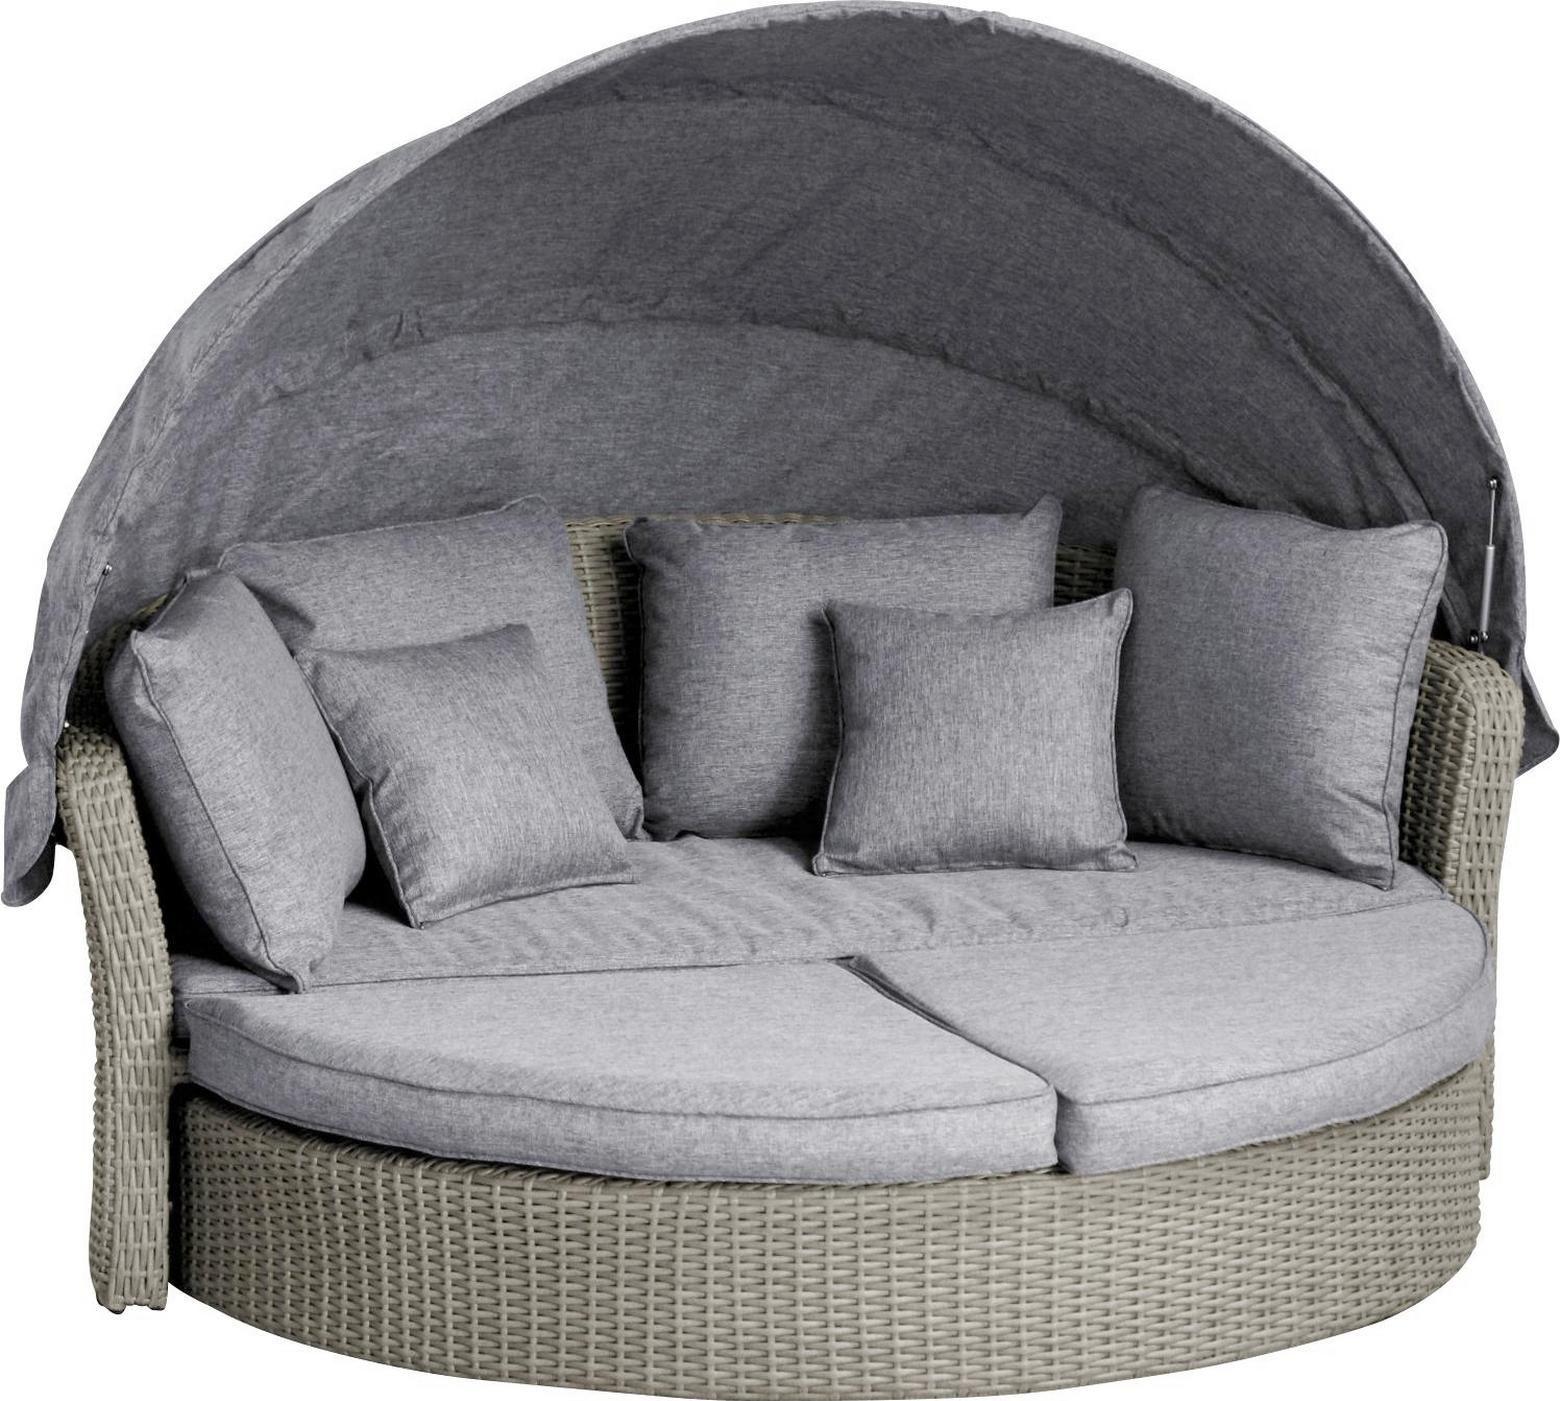 Grosszugige Sonneninsel Fur Den Garten Gartenlounge Outdoor Furniture Furniture Outdoor Bed